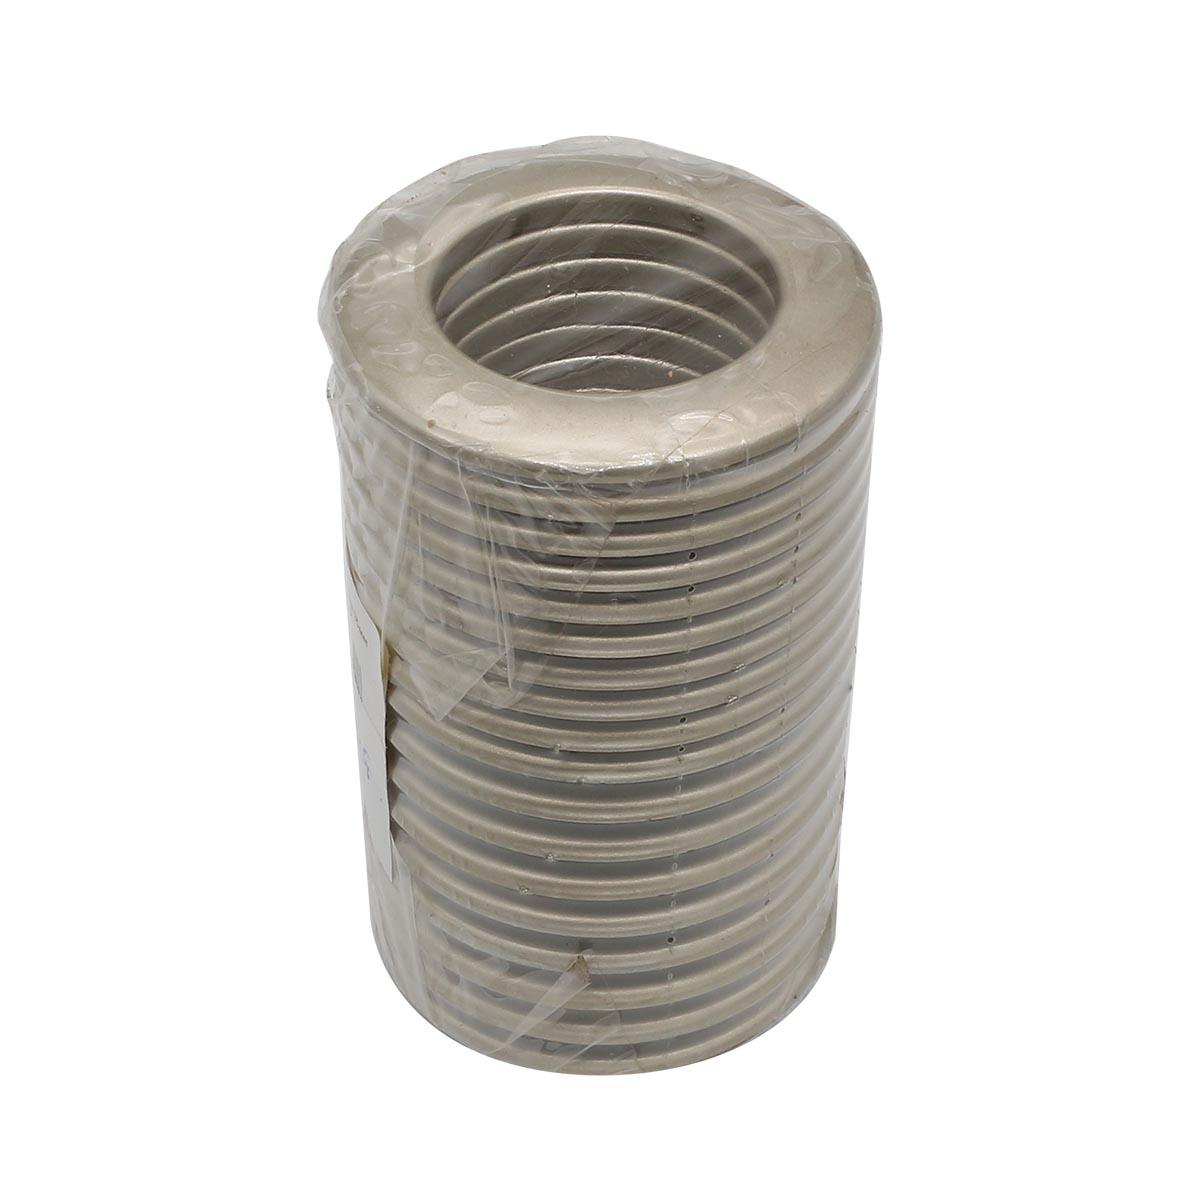 55-35-20 Люверс шторный 35мм матовая сталь ГР